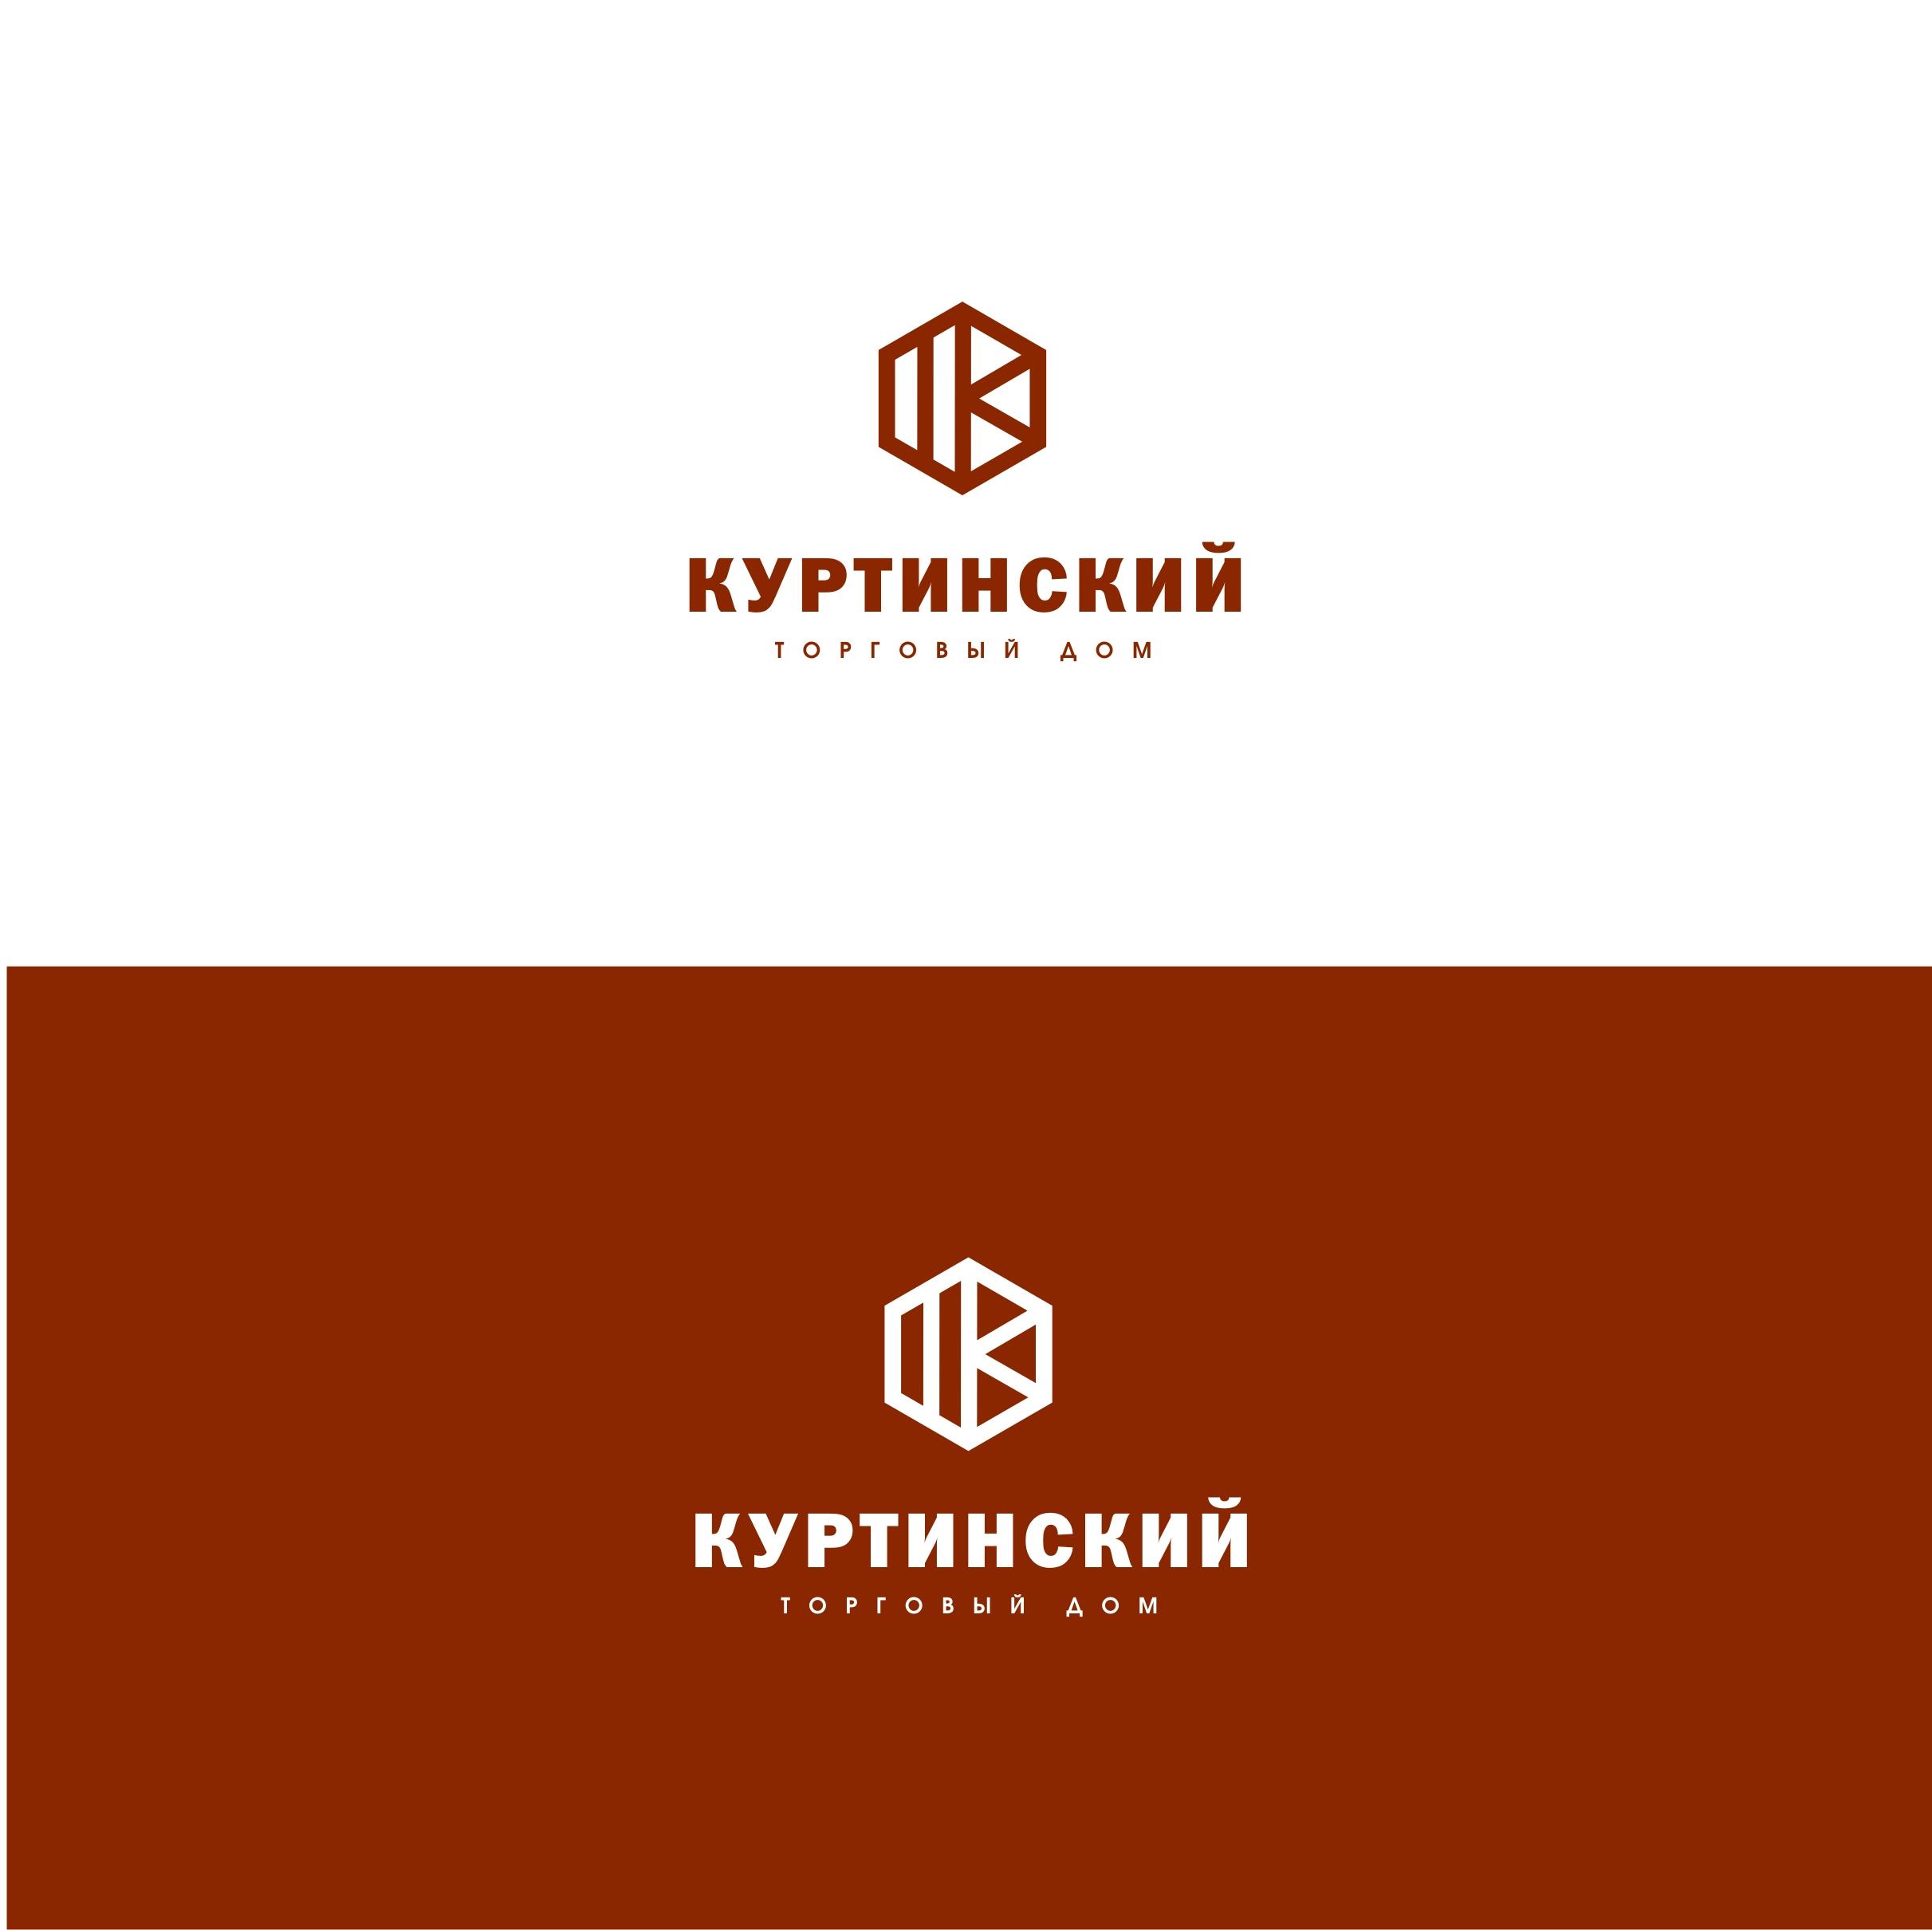 Логотип для камнедобывающей компании фото f_4195b9a525a54261.jpg